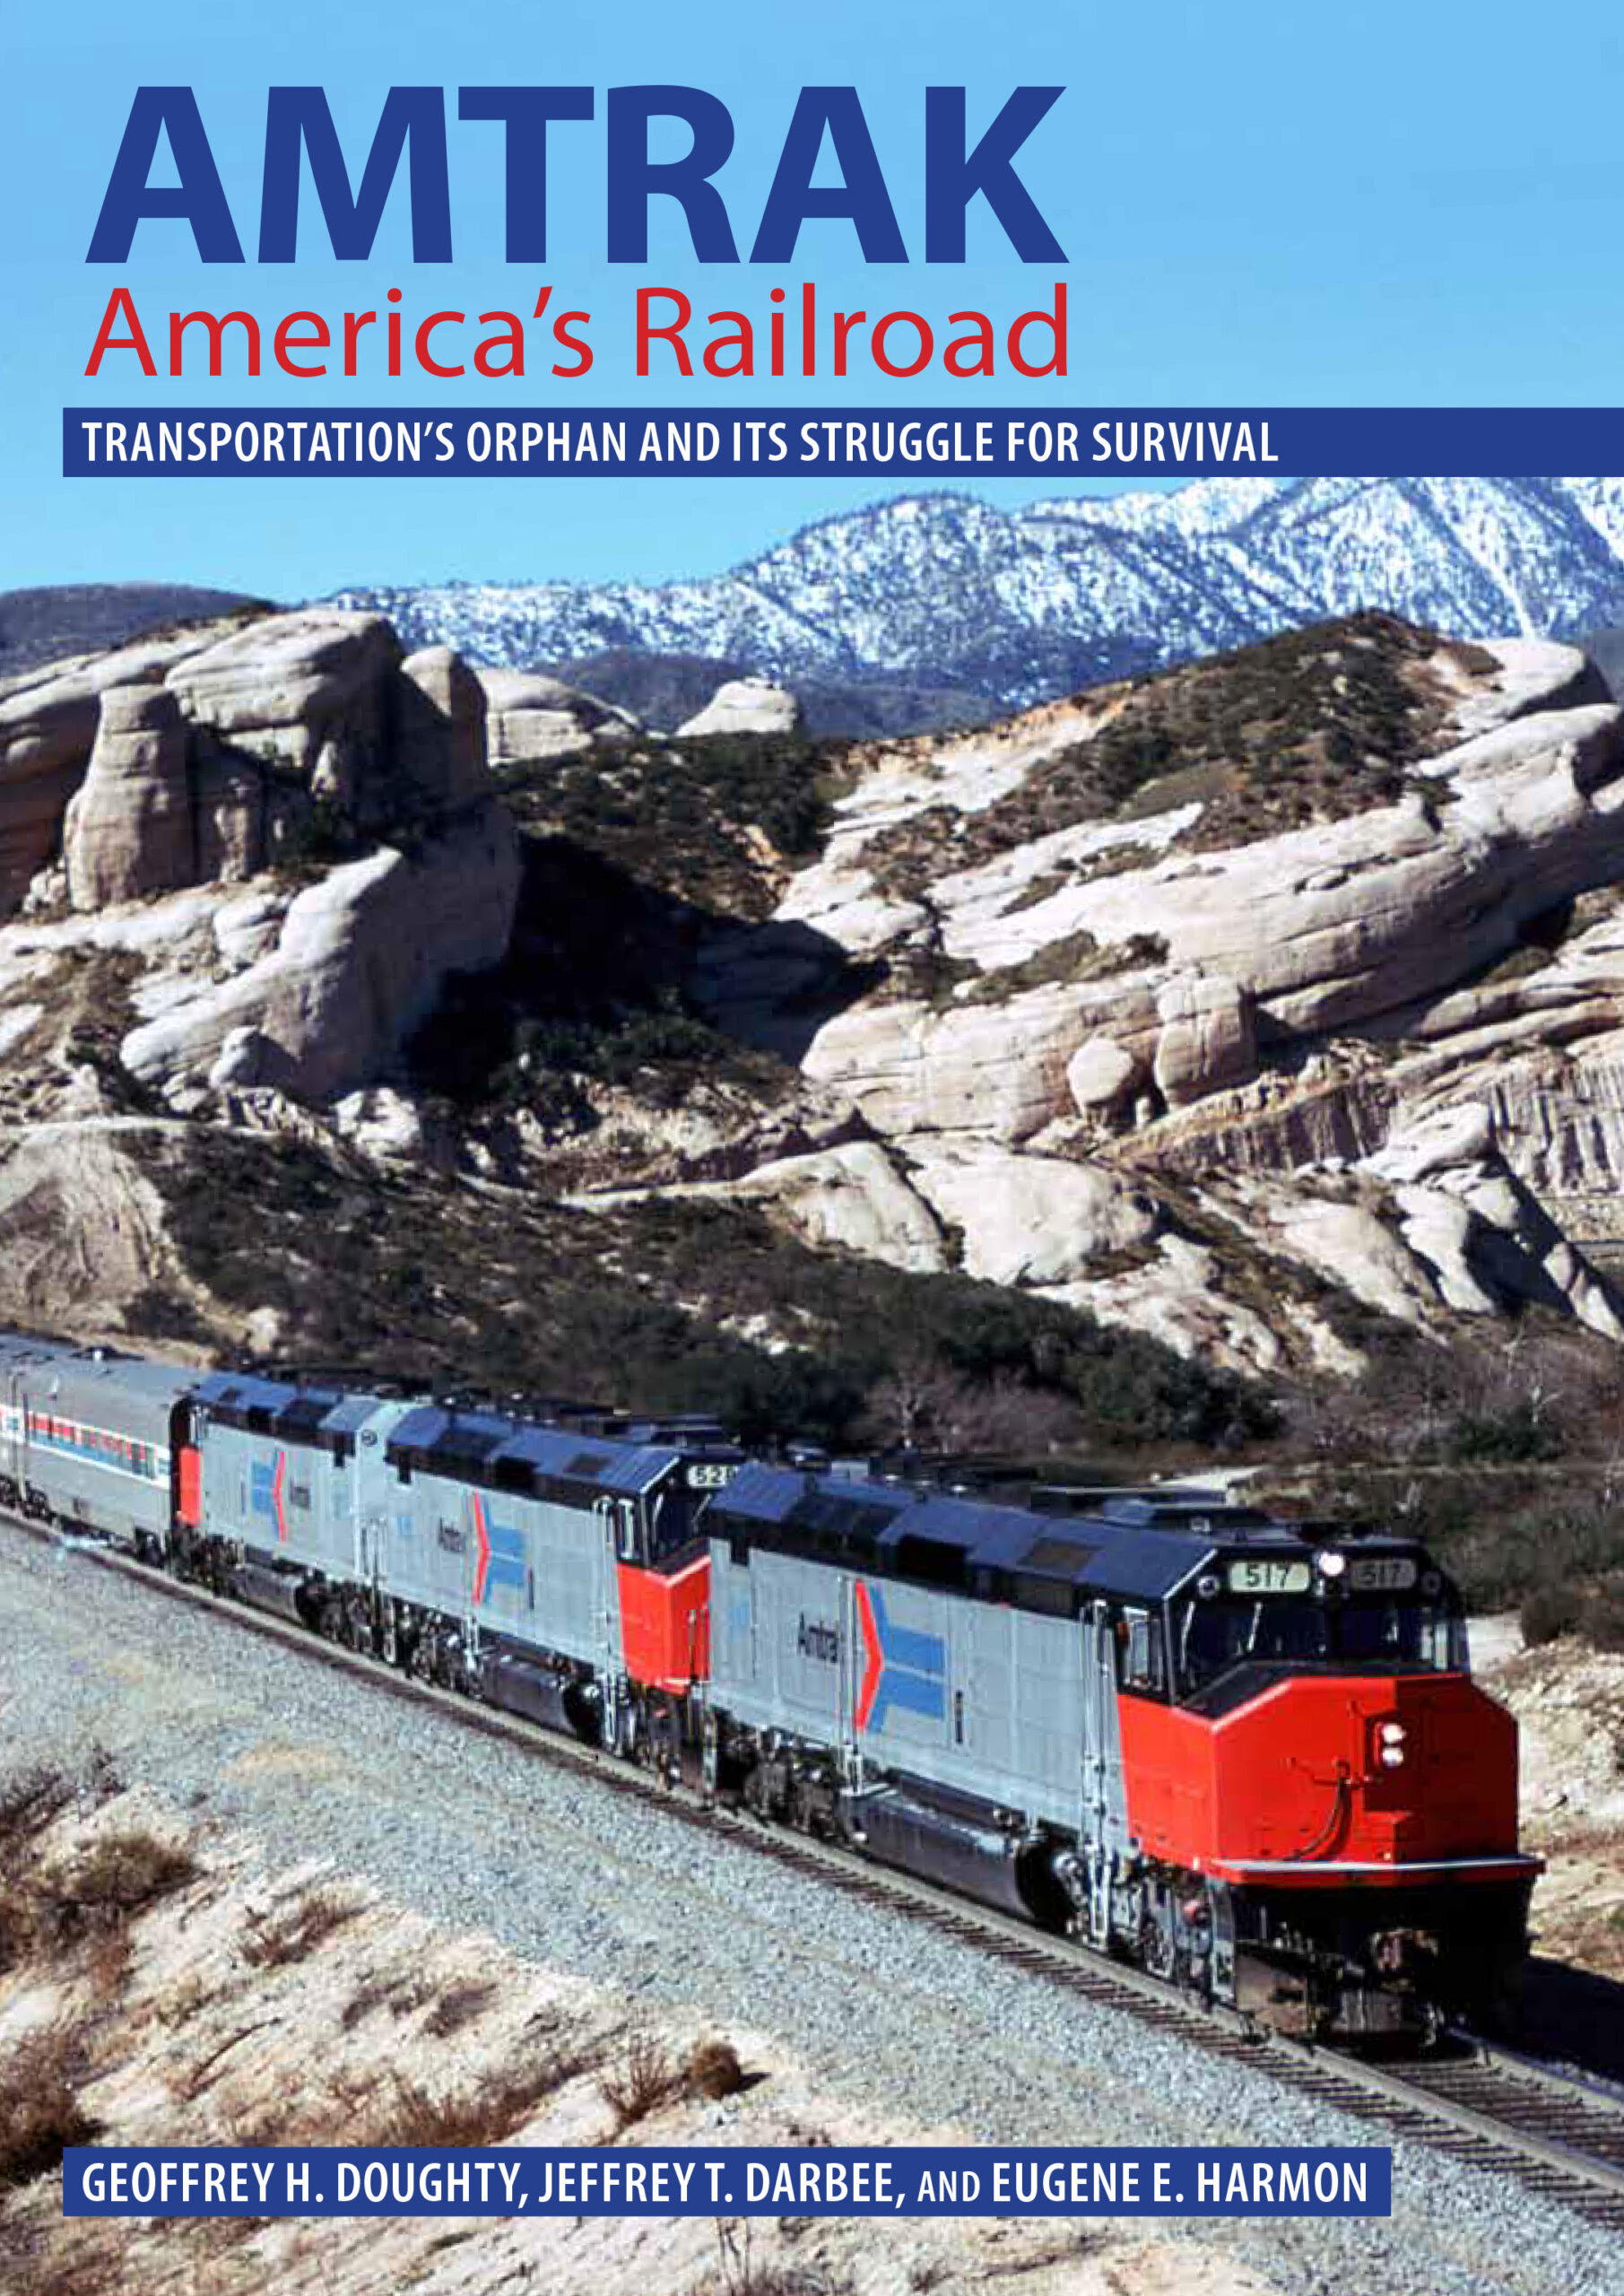 Amtrak, America